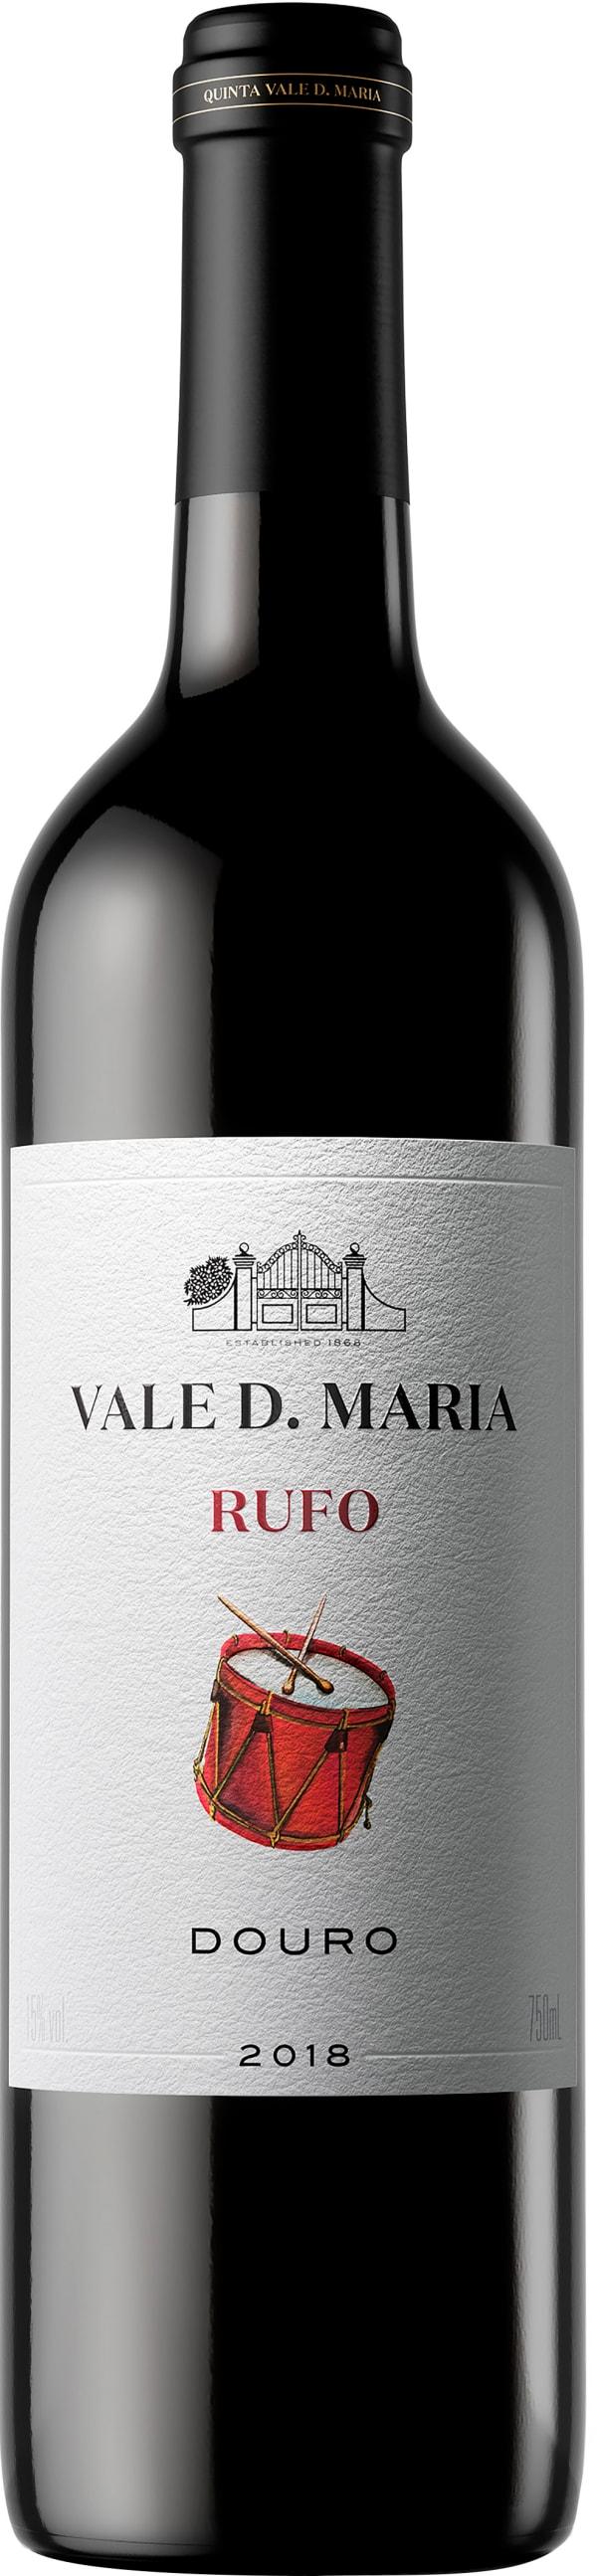 Vale D. Maria Rufo 2016